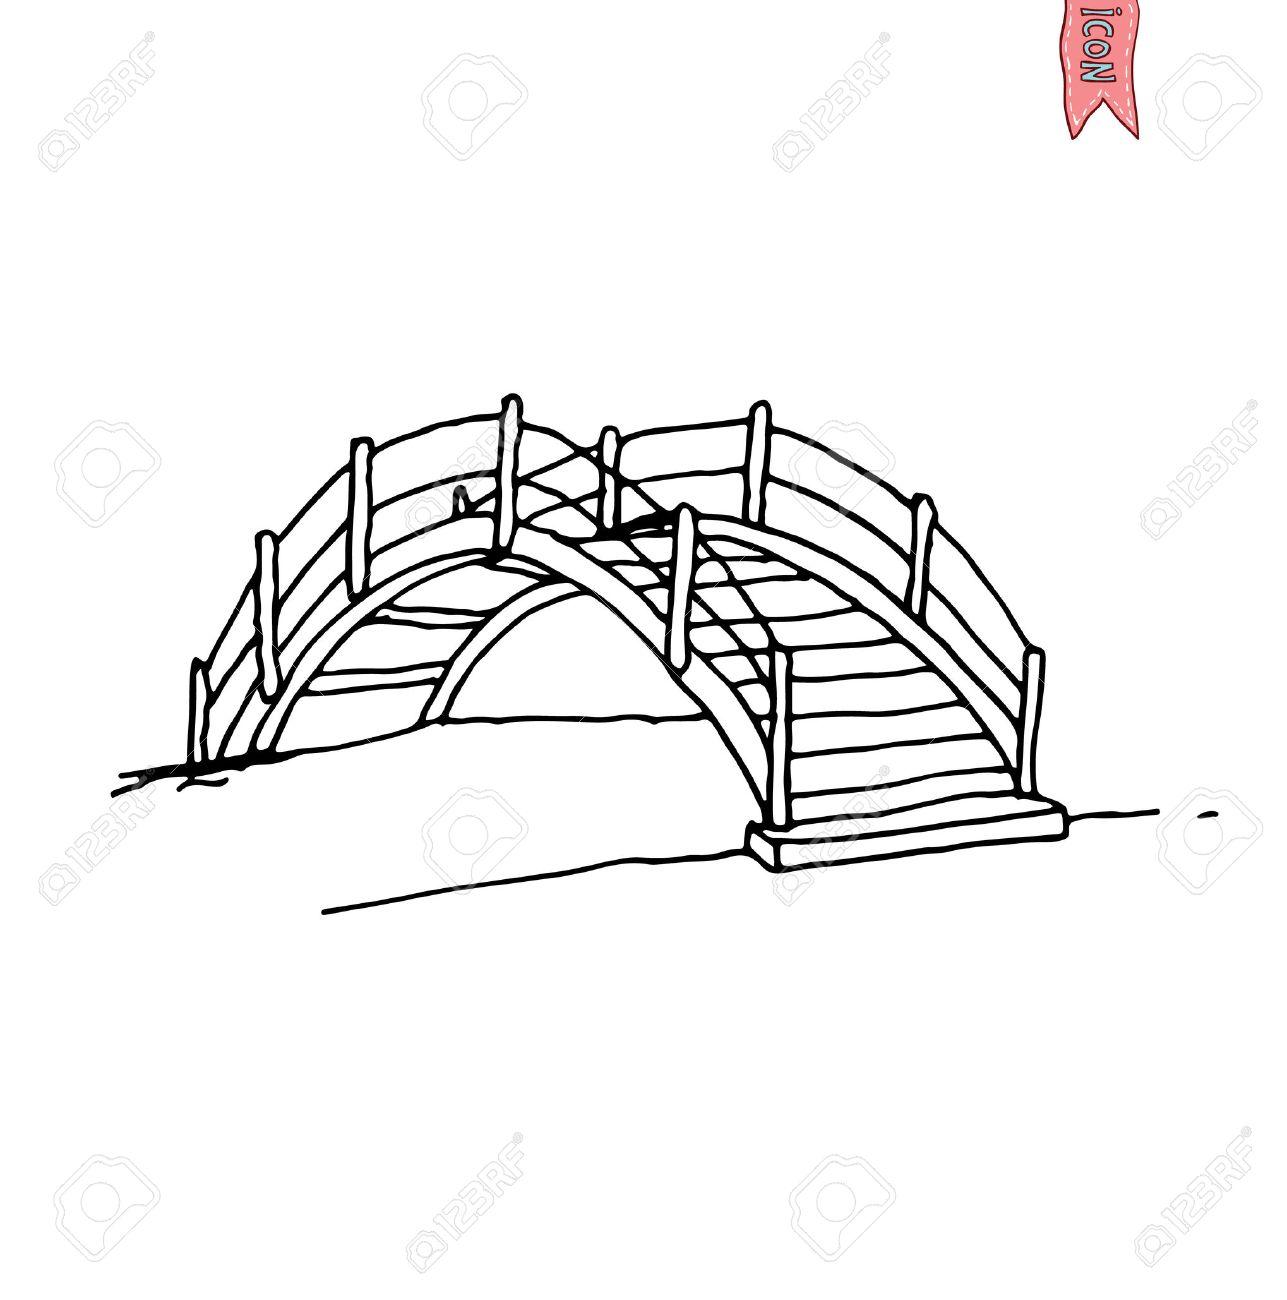 1287x1300 Wooden Arch Bridge, Vector Illustration. Royalty Free Cliparts